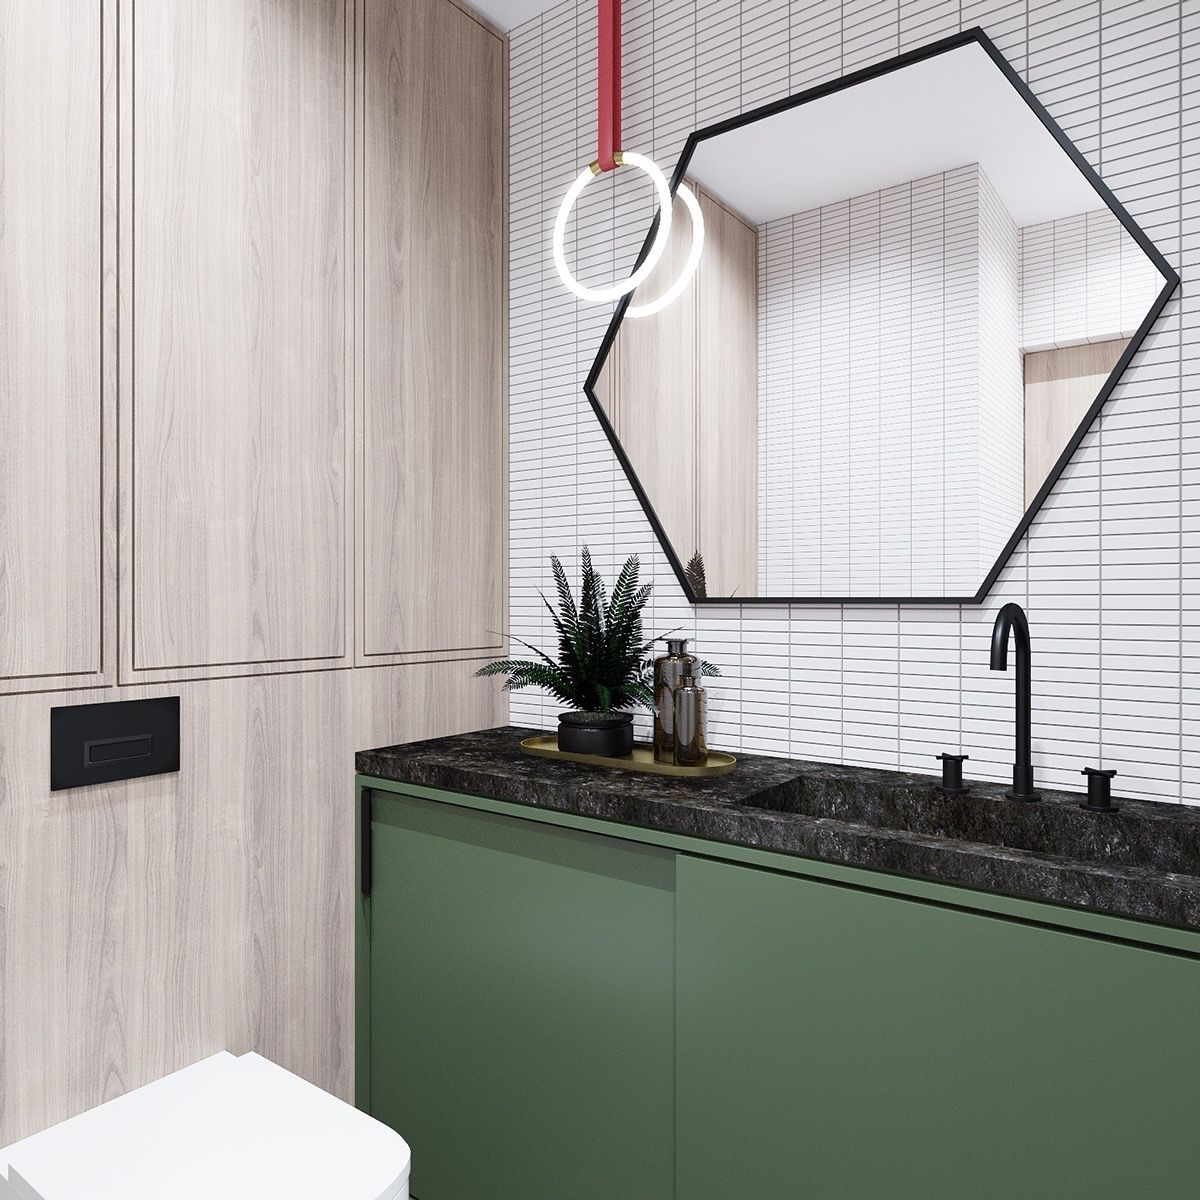 Small Apartment Design Under 600 Square Feet   Small bathroom ...